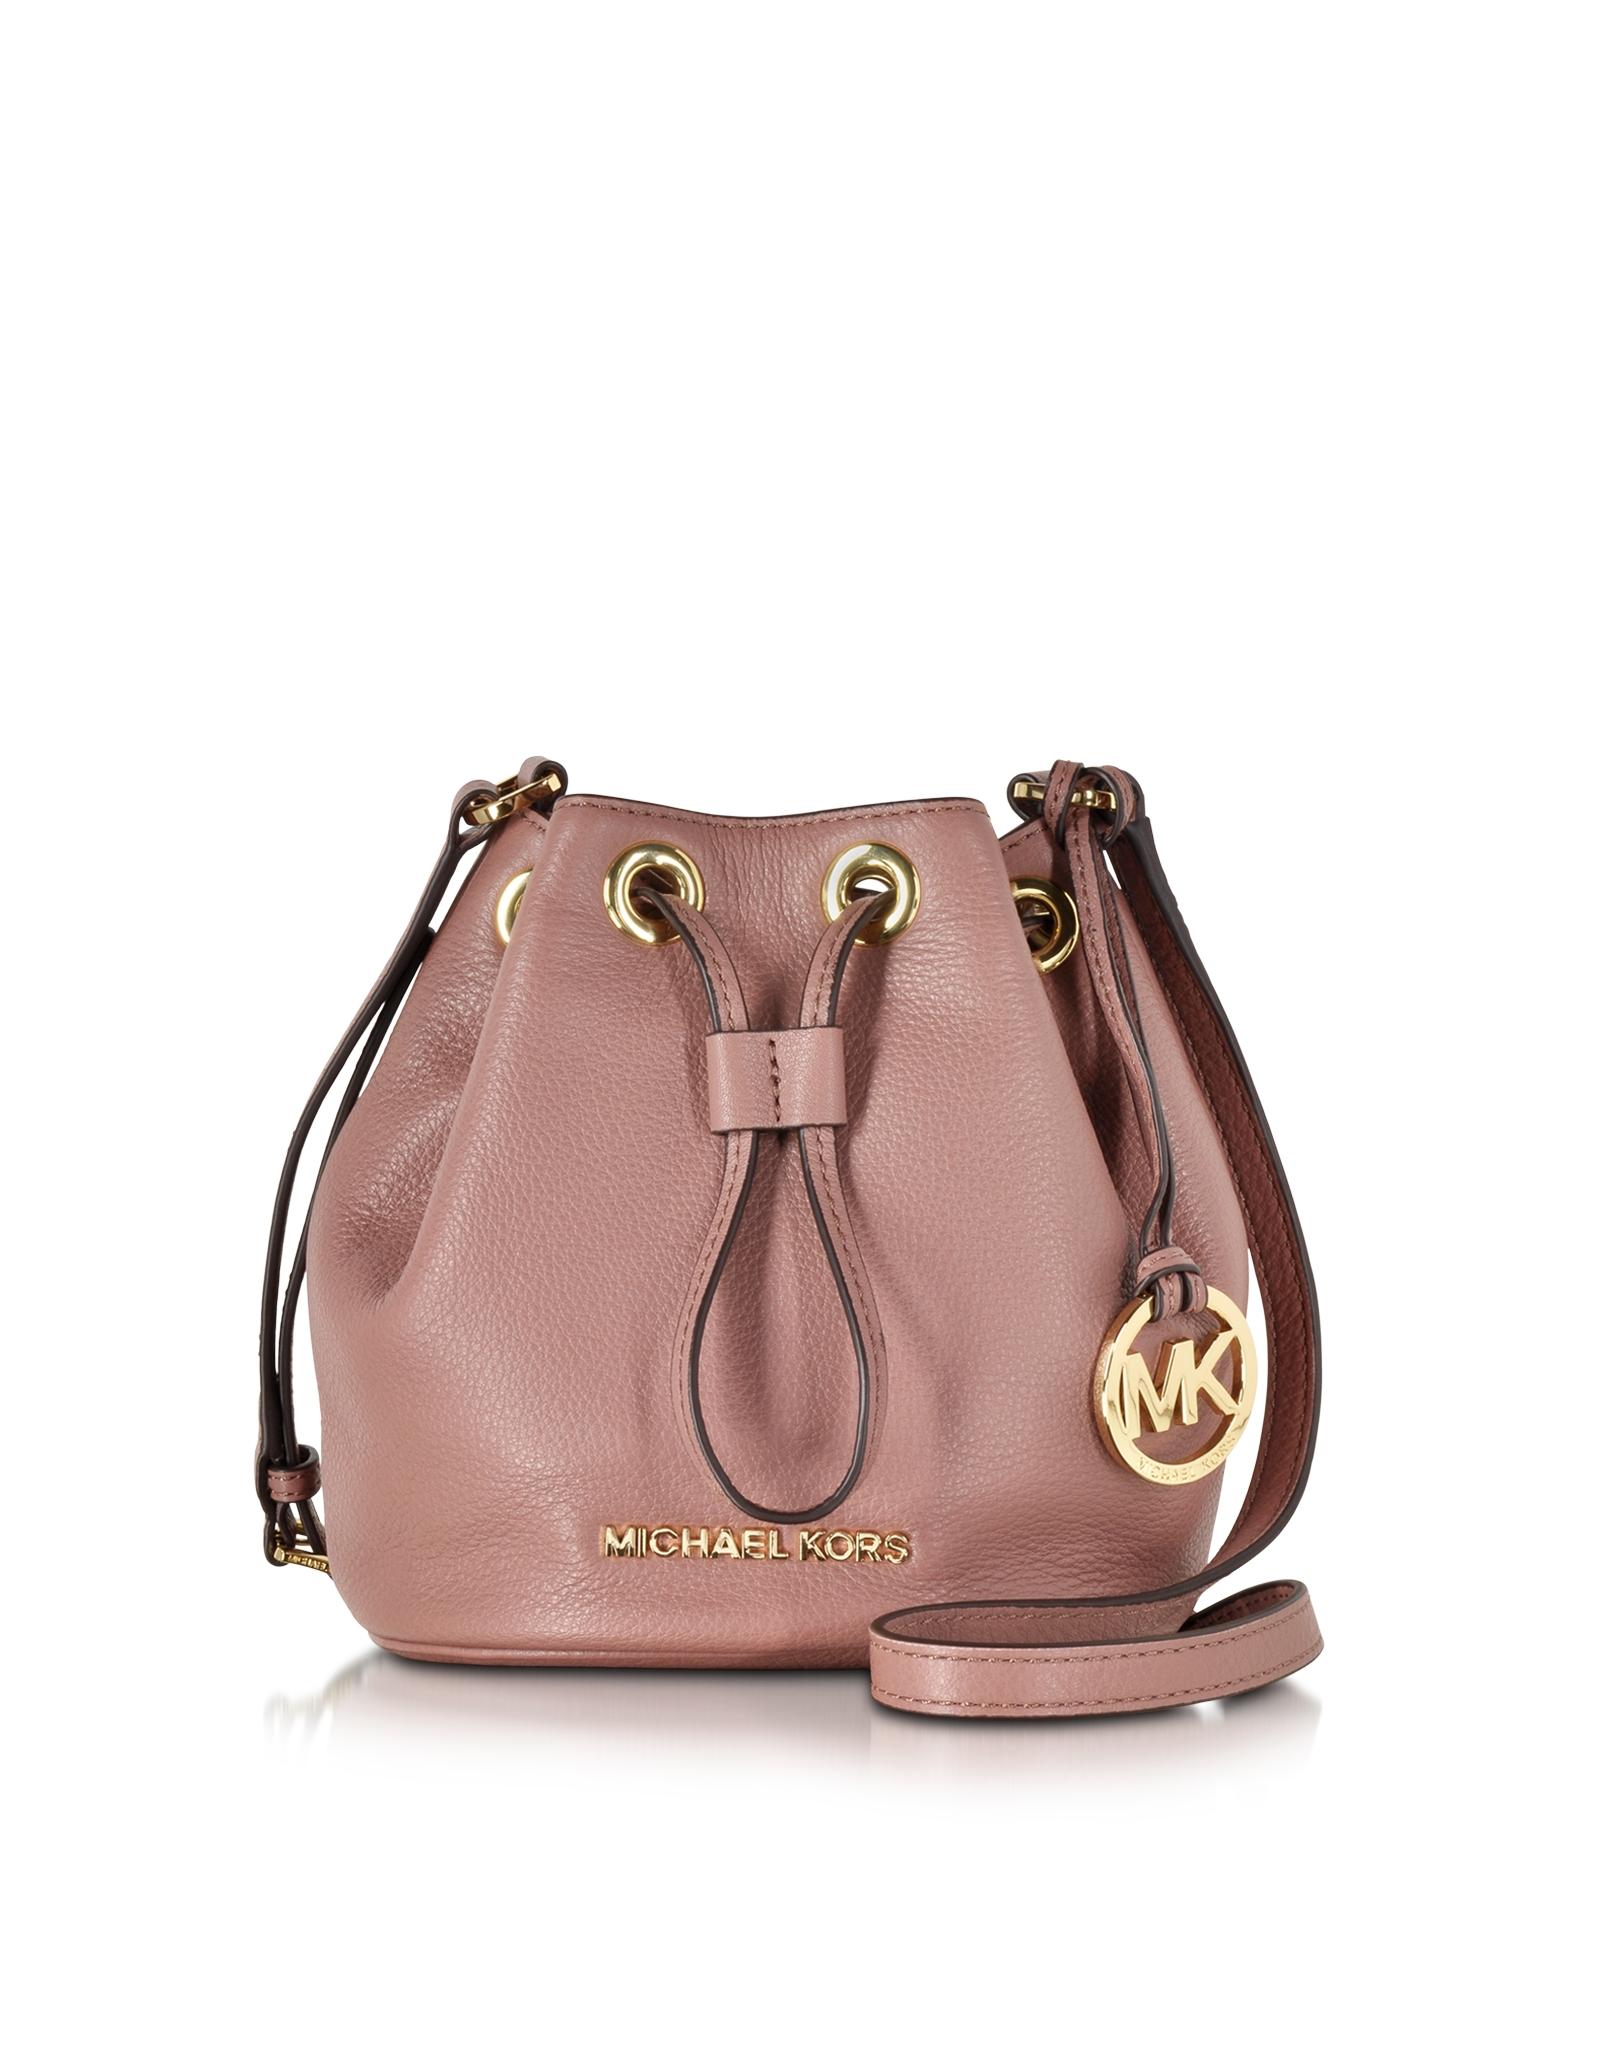 michael kors jules soft leather drawstring crossbody bag in pink lyst rh lyst com au